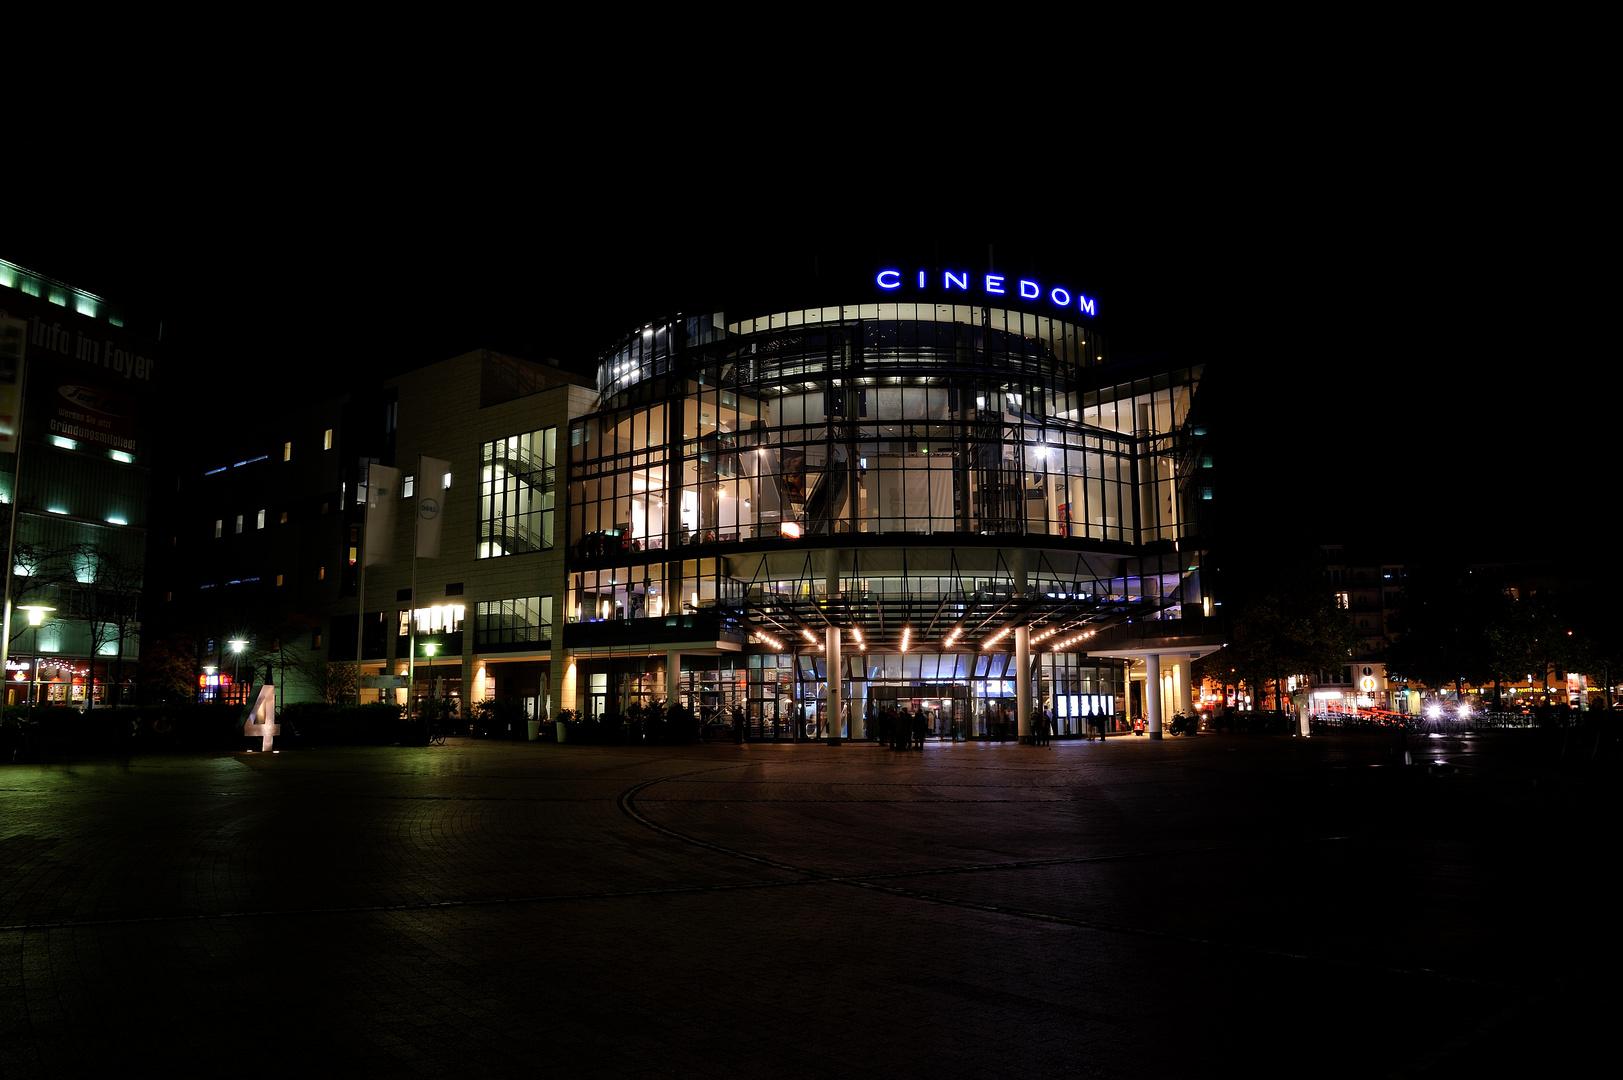 Ein Abendspaziergang am Mediapark (3)